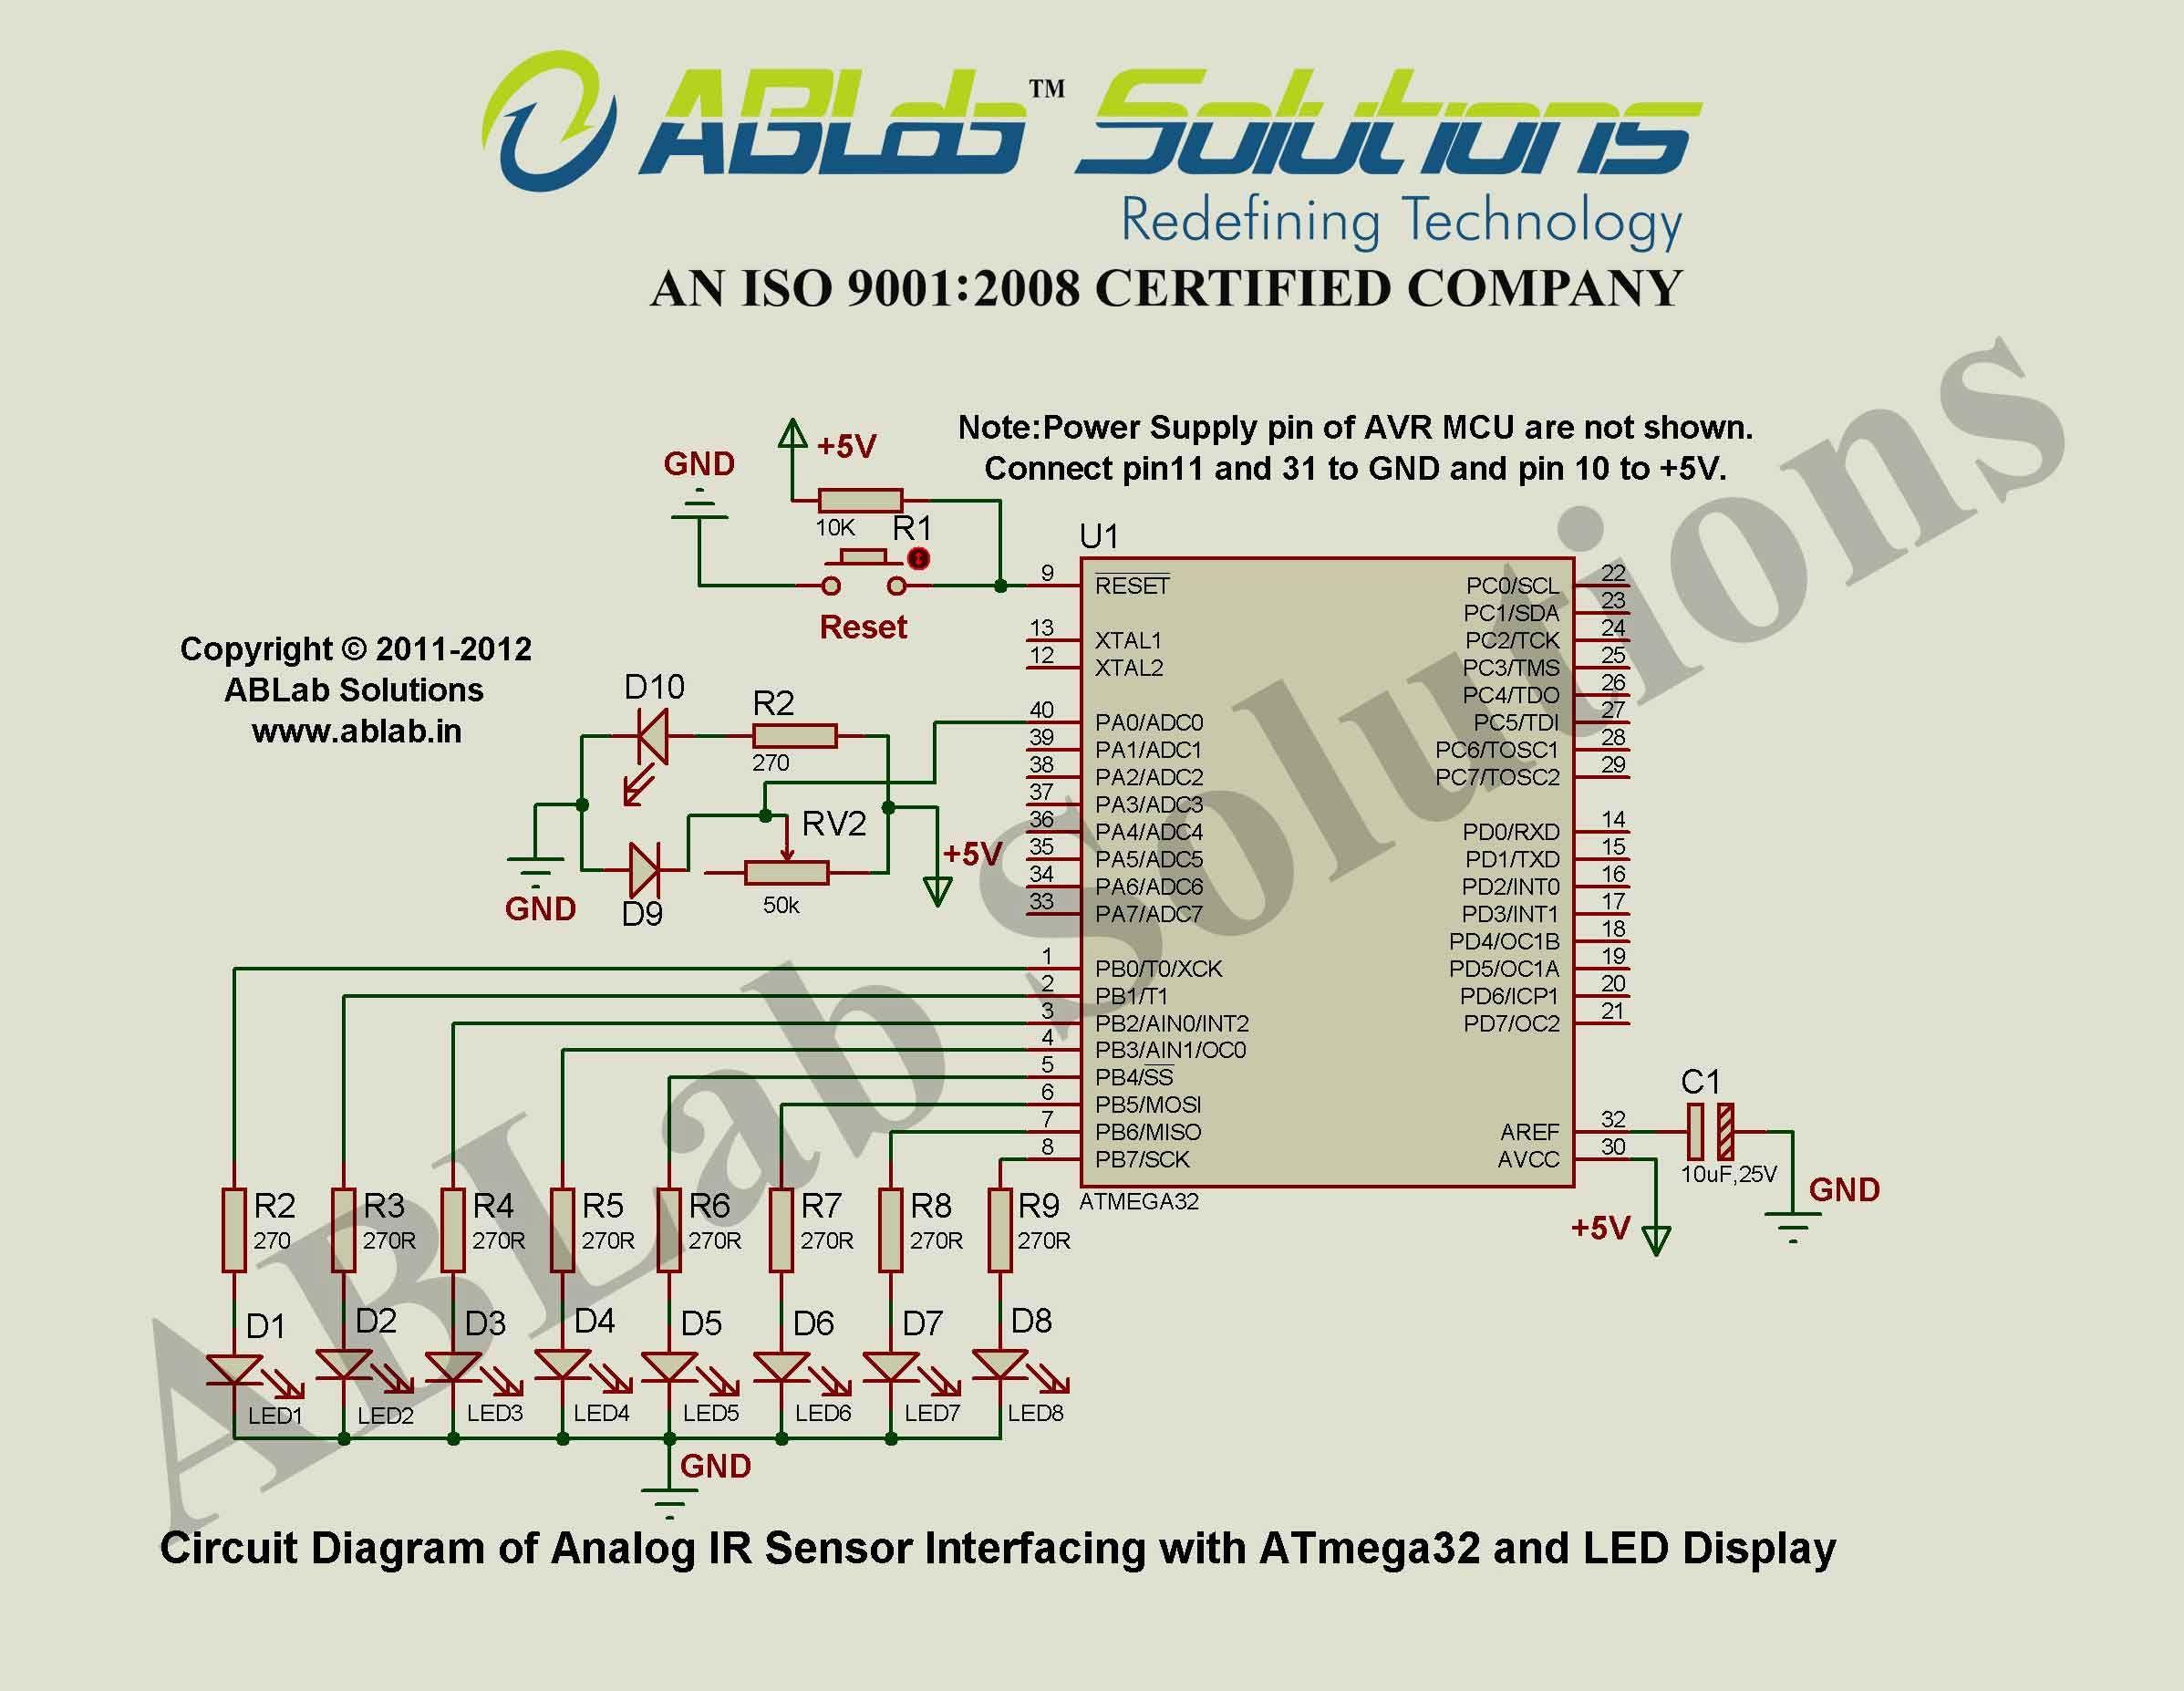 How To Interface Analog Ir Sensor With Avr Atmega32 Microcontroller Microcontrollers Circuit Diagram Sensor